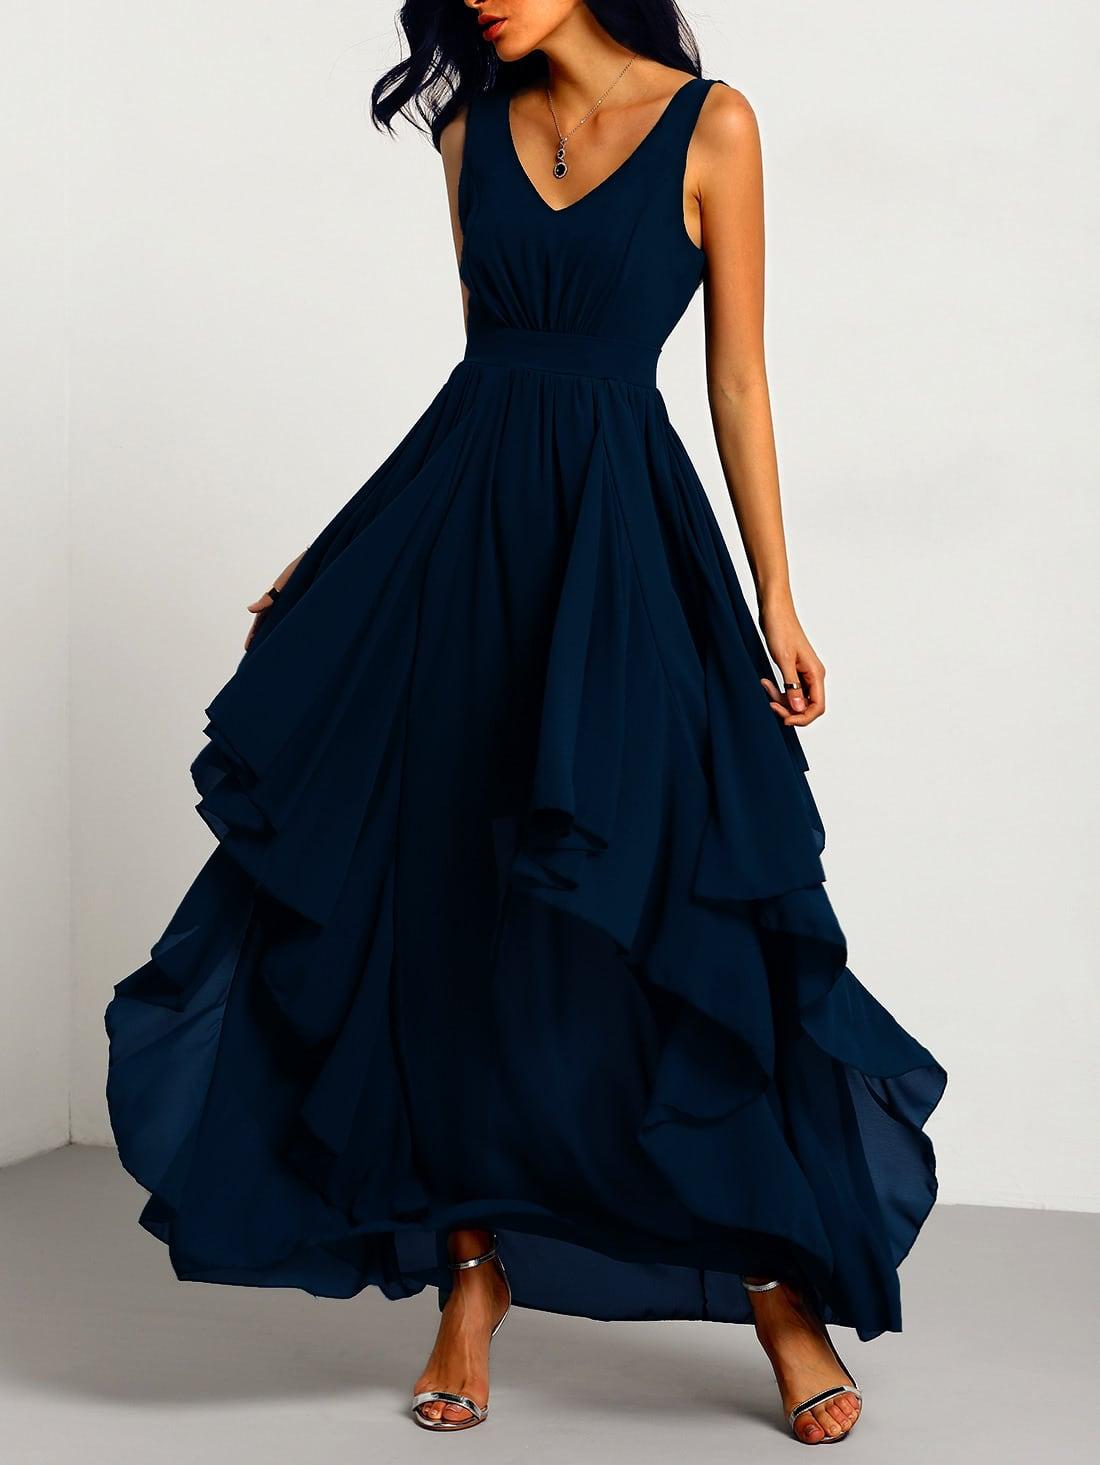 V Neckline Layered Maxi Chiffon Dress dress160905123